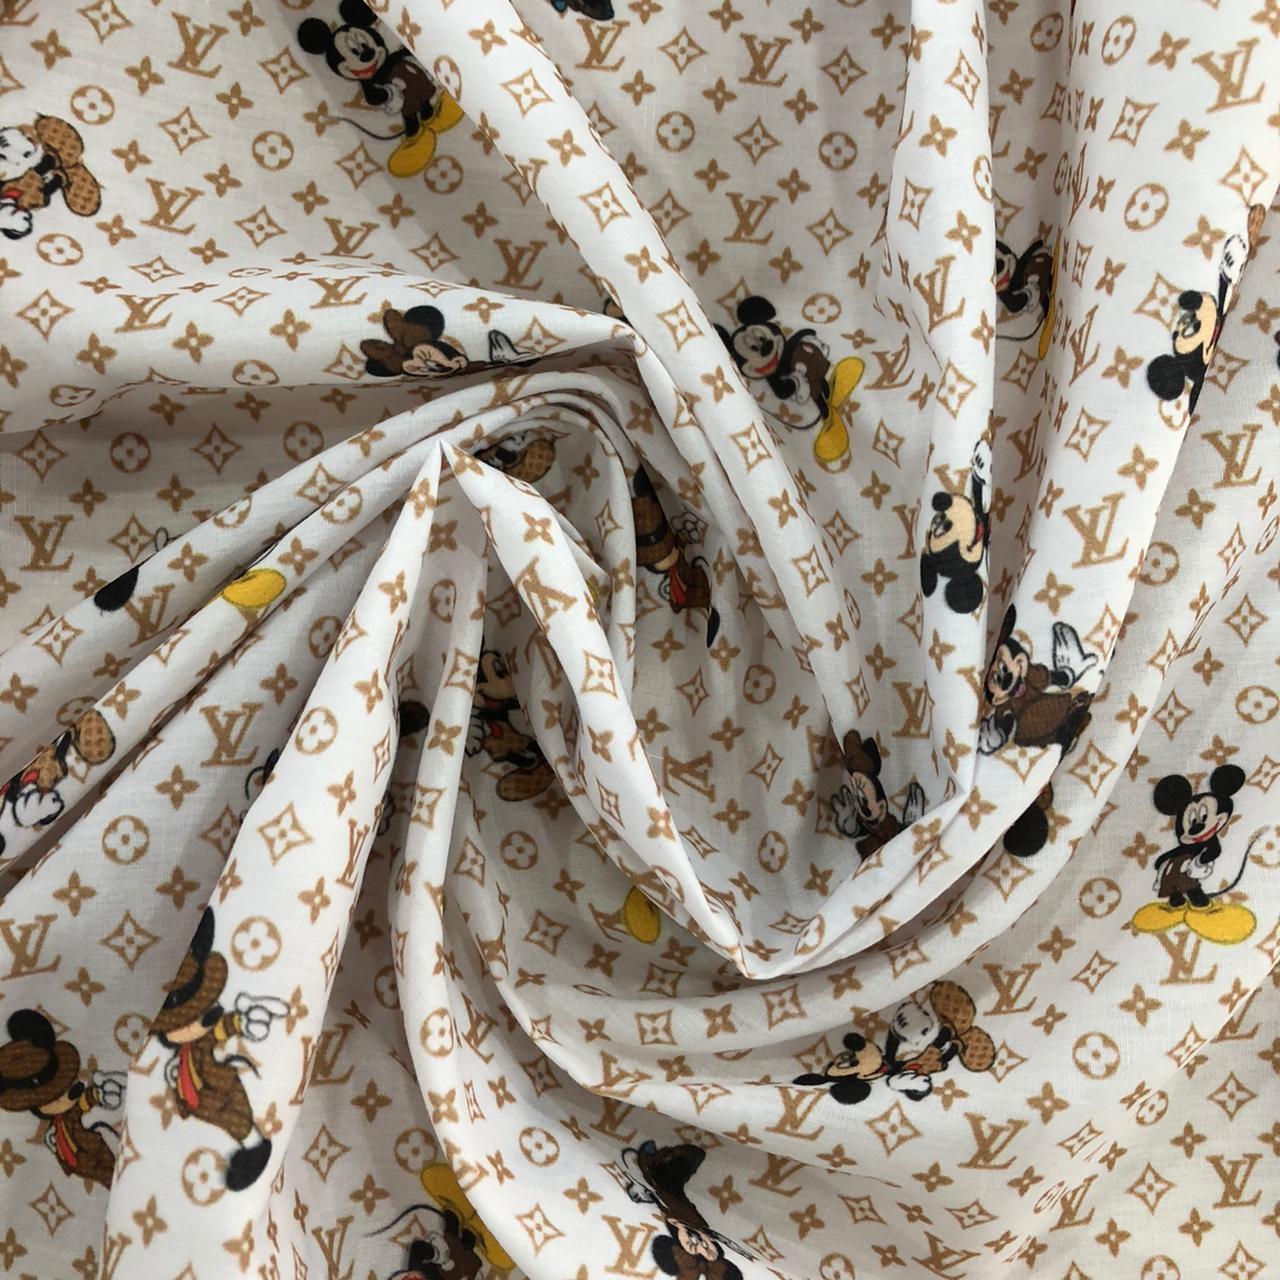 Tecido Tricoline Mista Estampada 65%Poliéster 35%Algodão Mickey Louis Vuitton